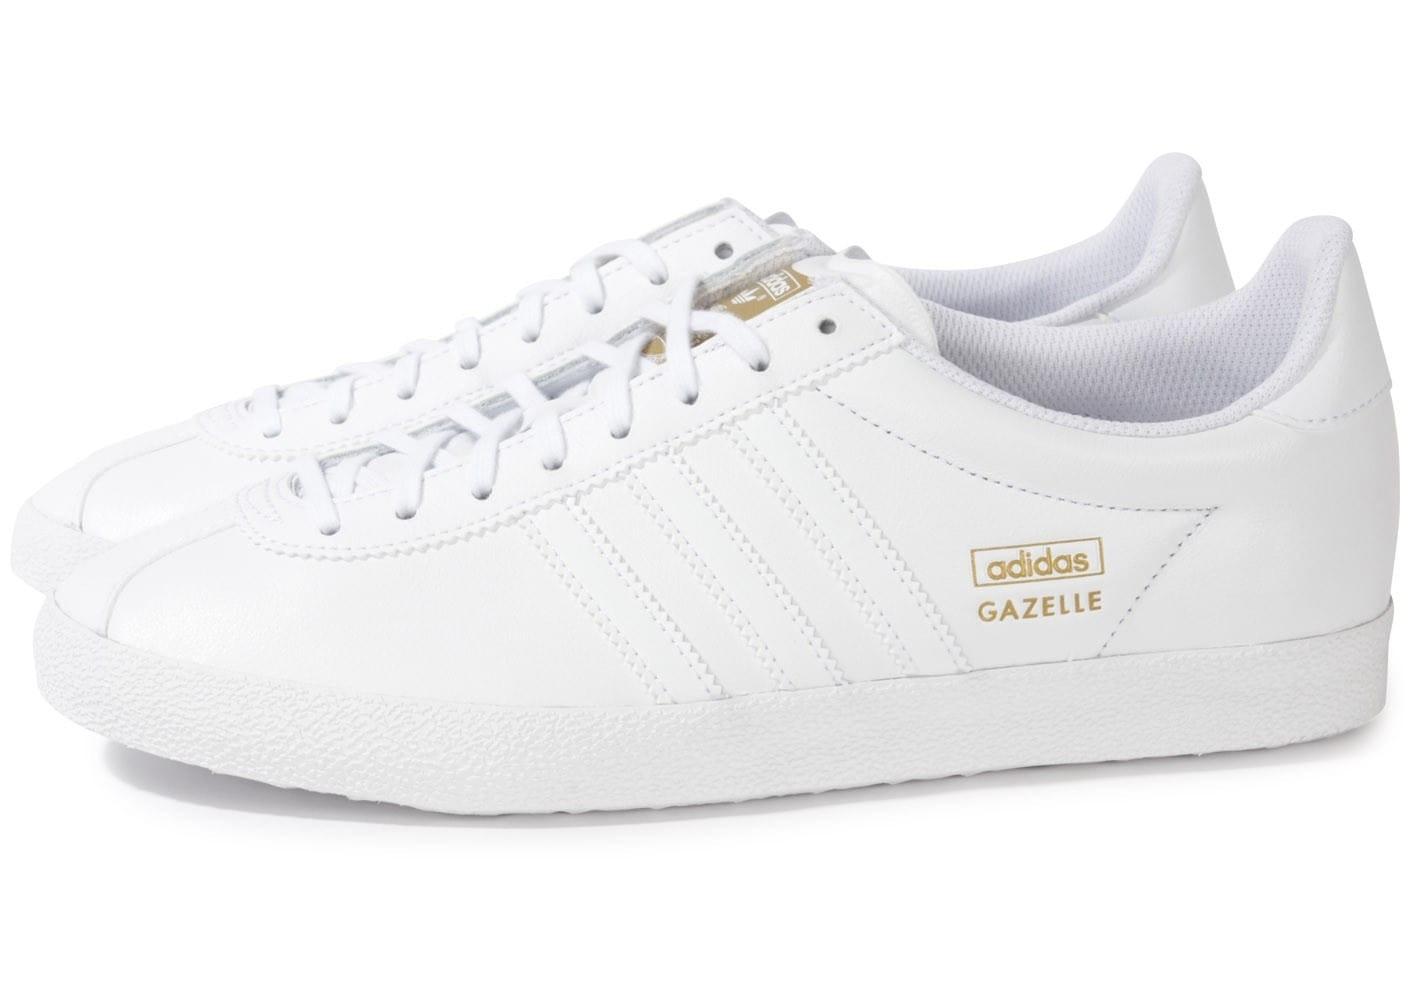 chaussures homme adidas gazelle